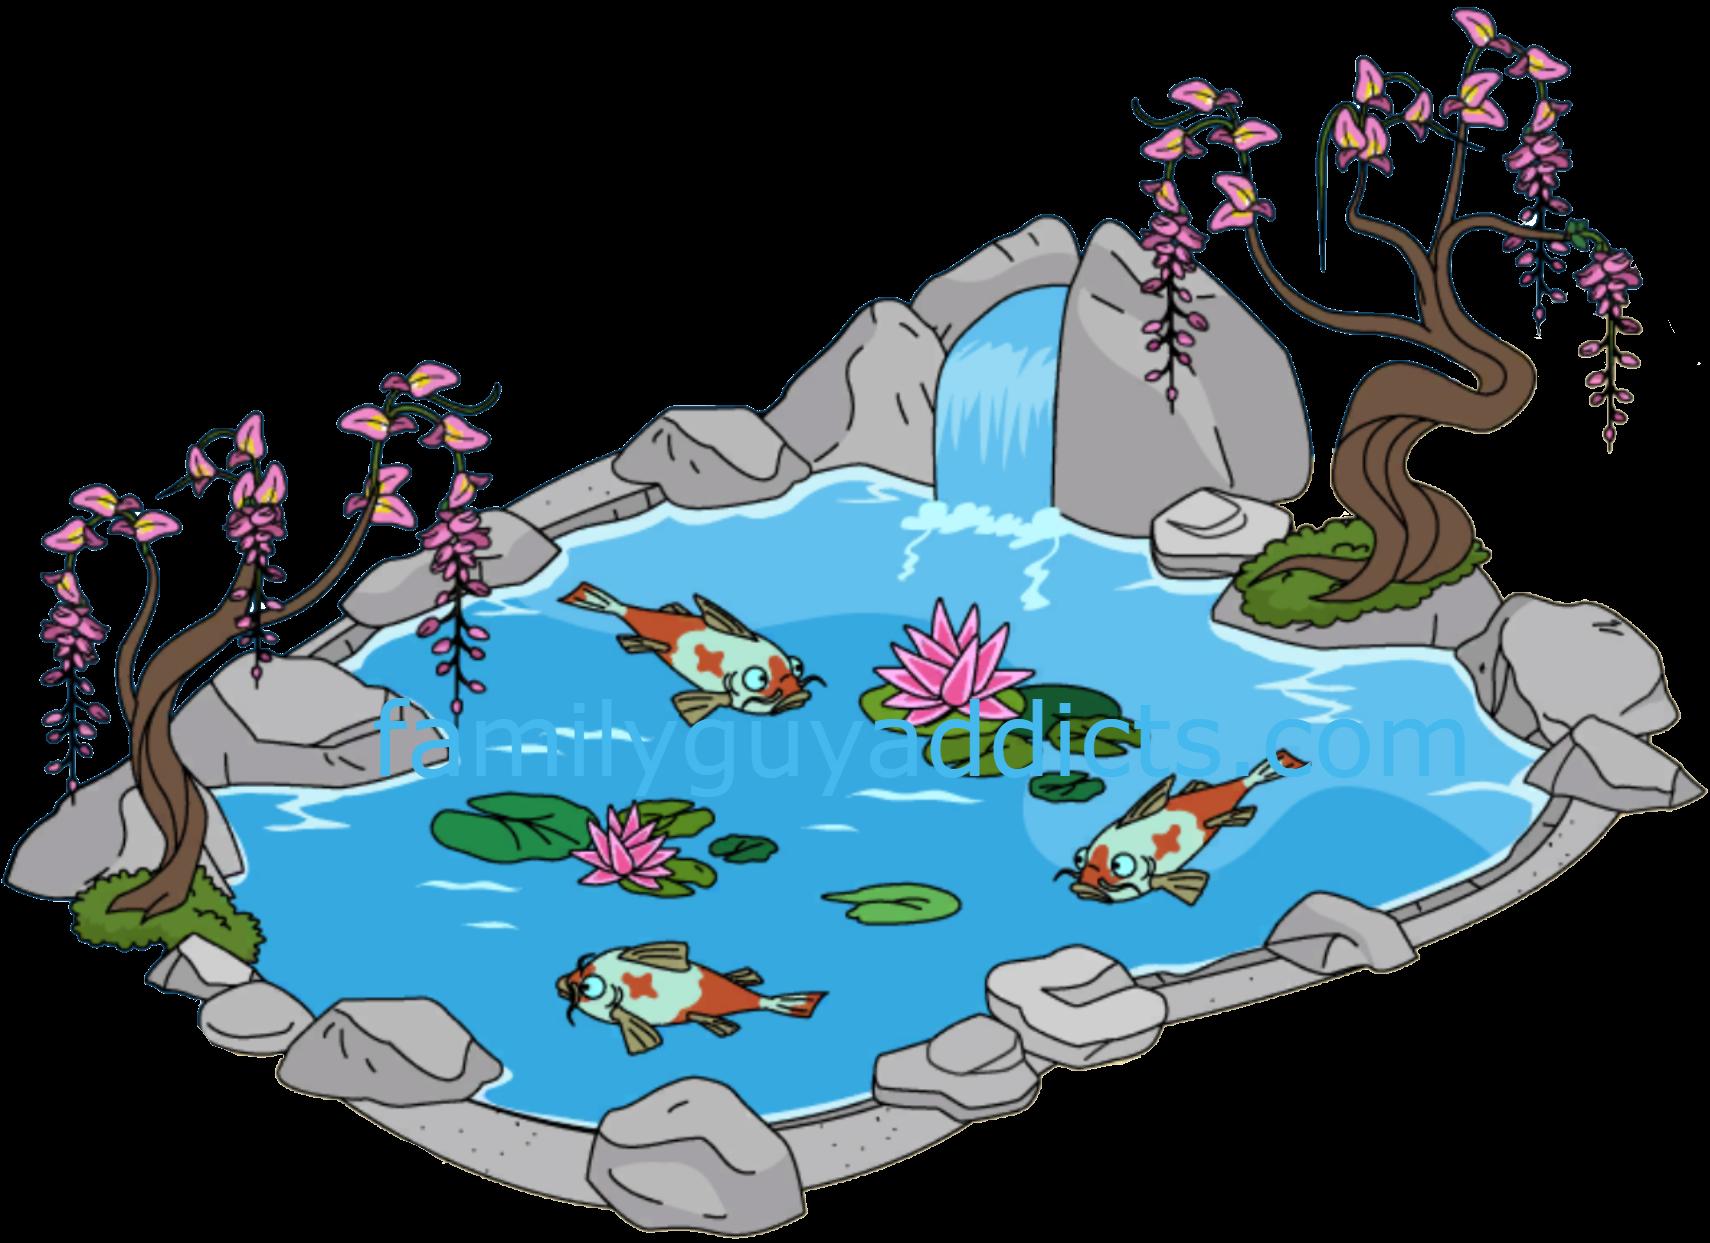 Lake clipart koi pond. Splashy family guy addicts